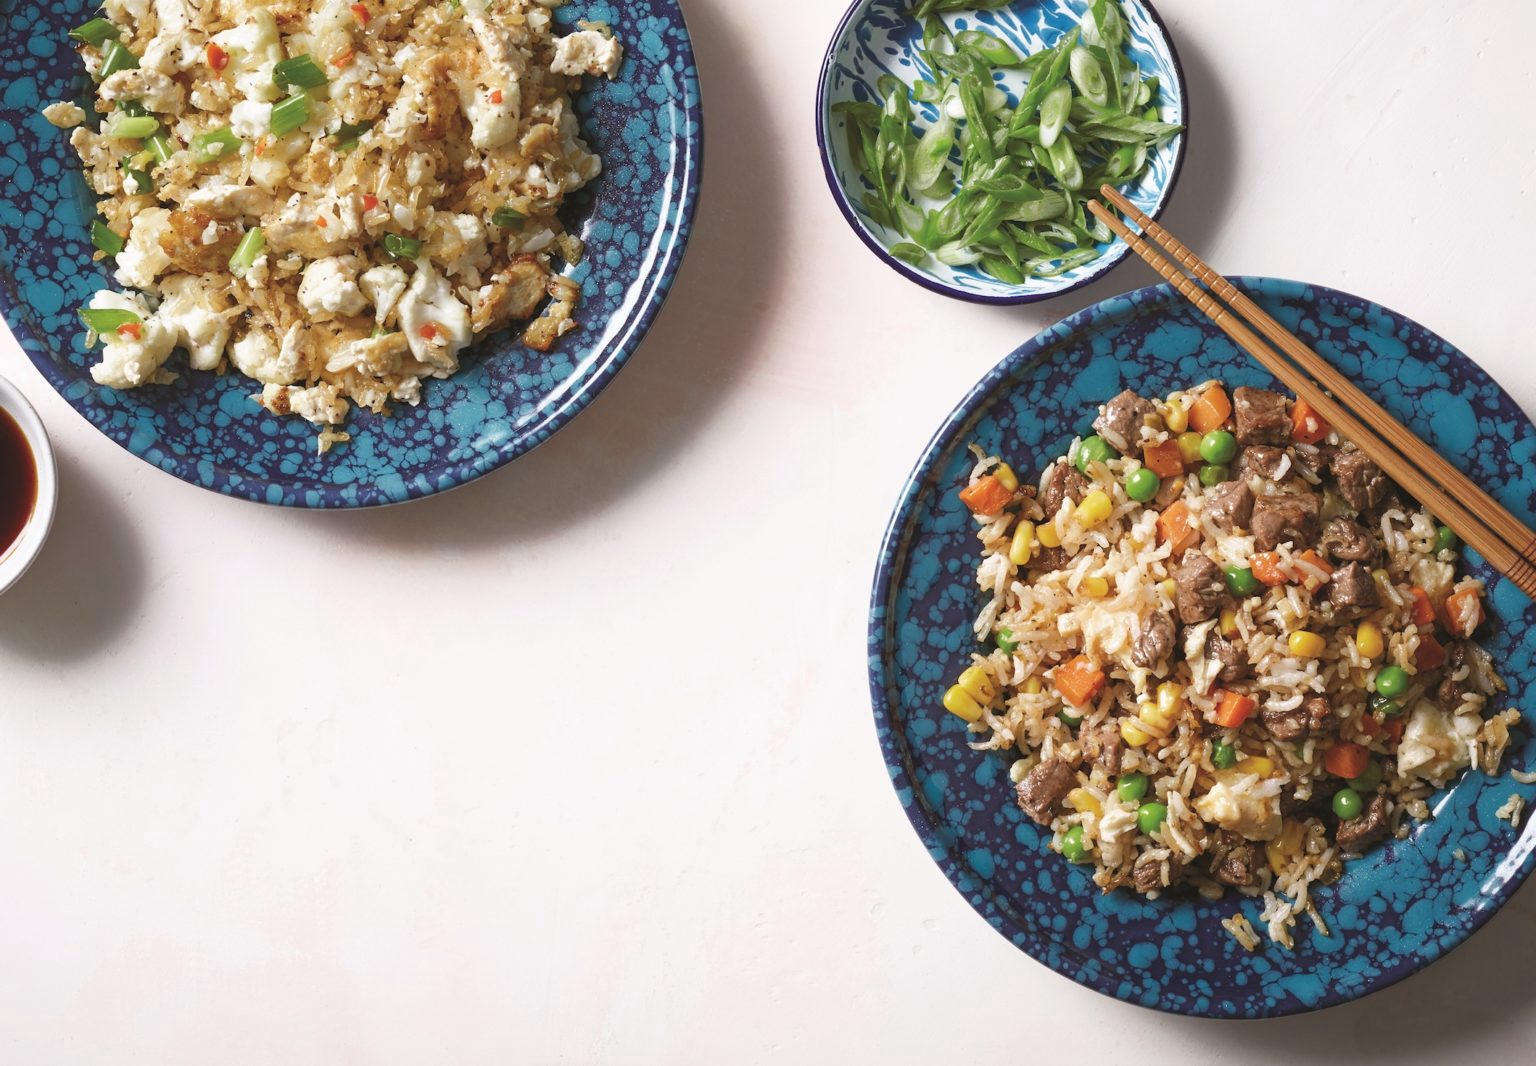 Mark Bittman's Fried Rice